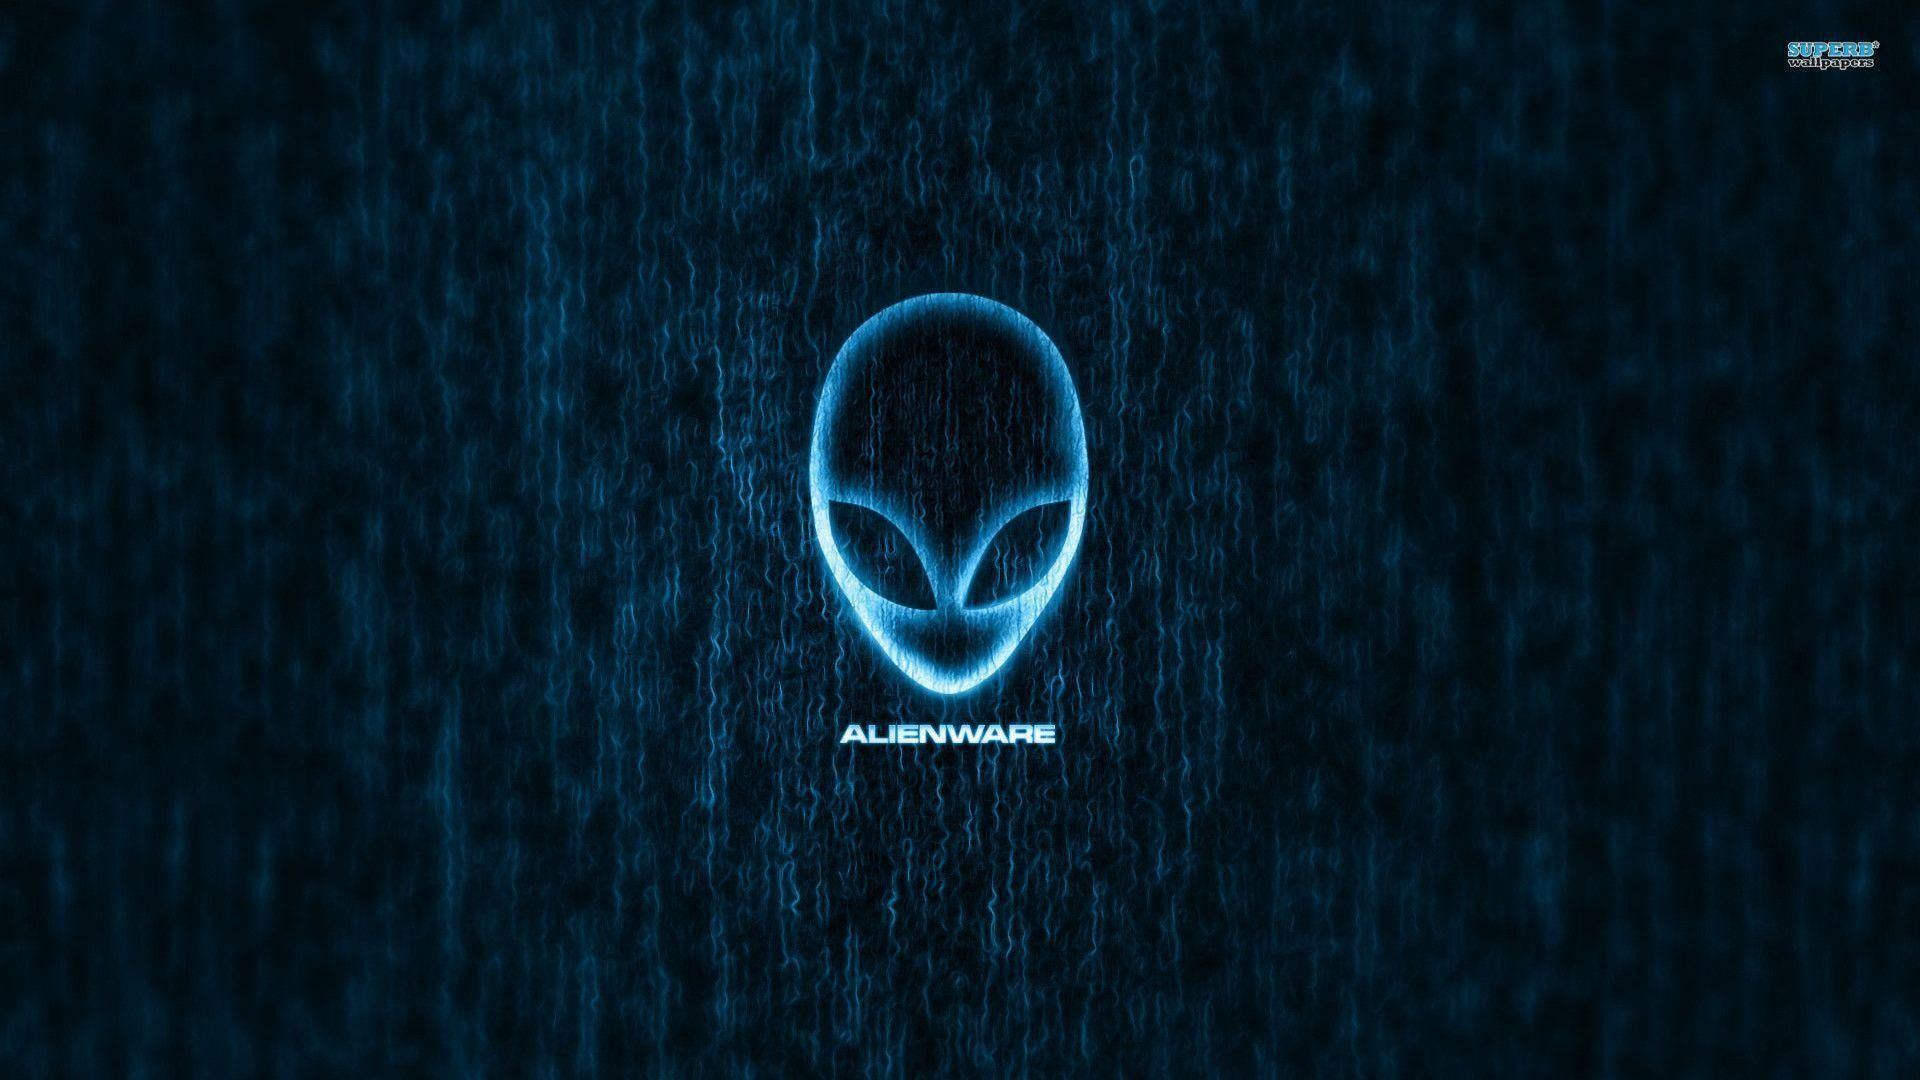 Res 1920x1080 4k Ultra Alienware 100 Quality Hd Images Alienware 1080p Wallpaper Name Wallpaper